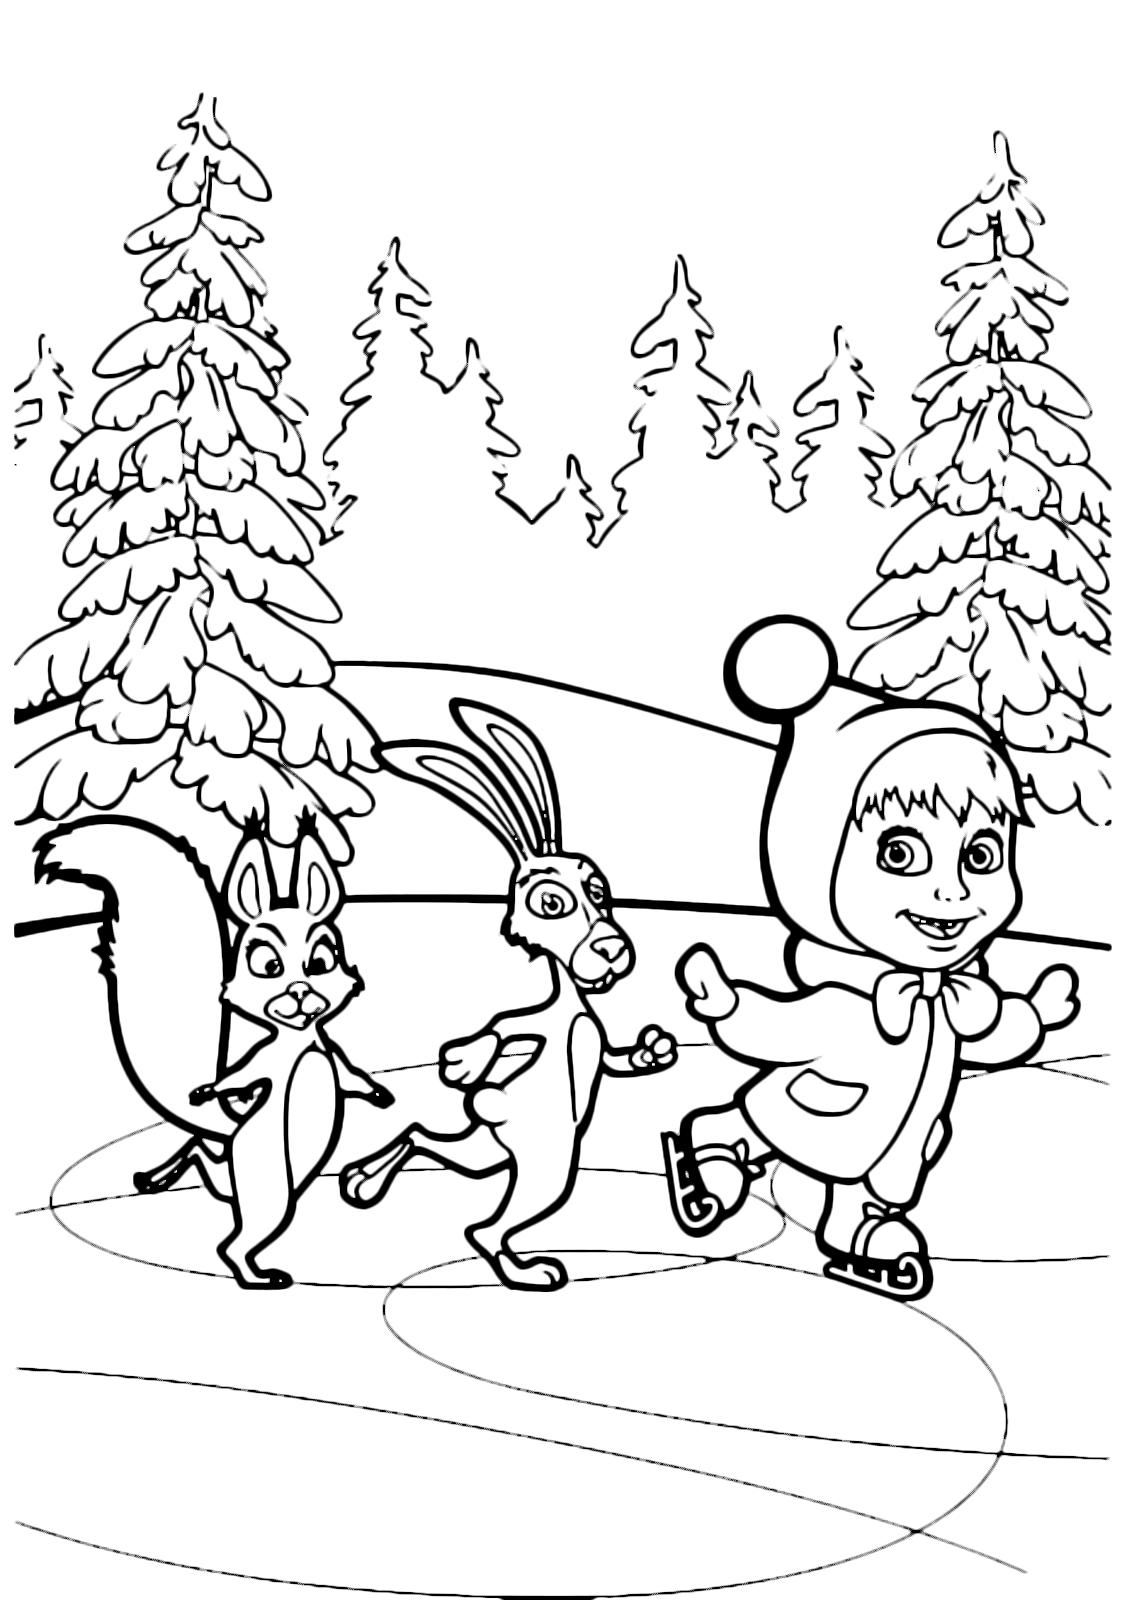 Gambar Sketsa Kelinci Dan Wortel 28 Images маша и медвед Card